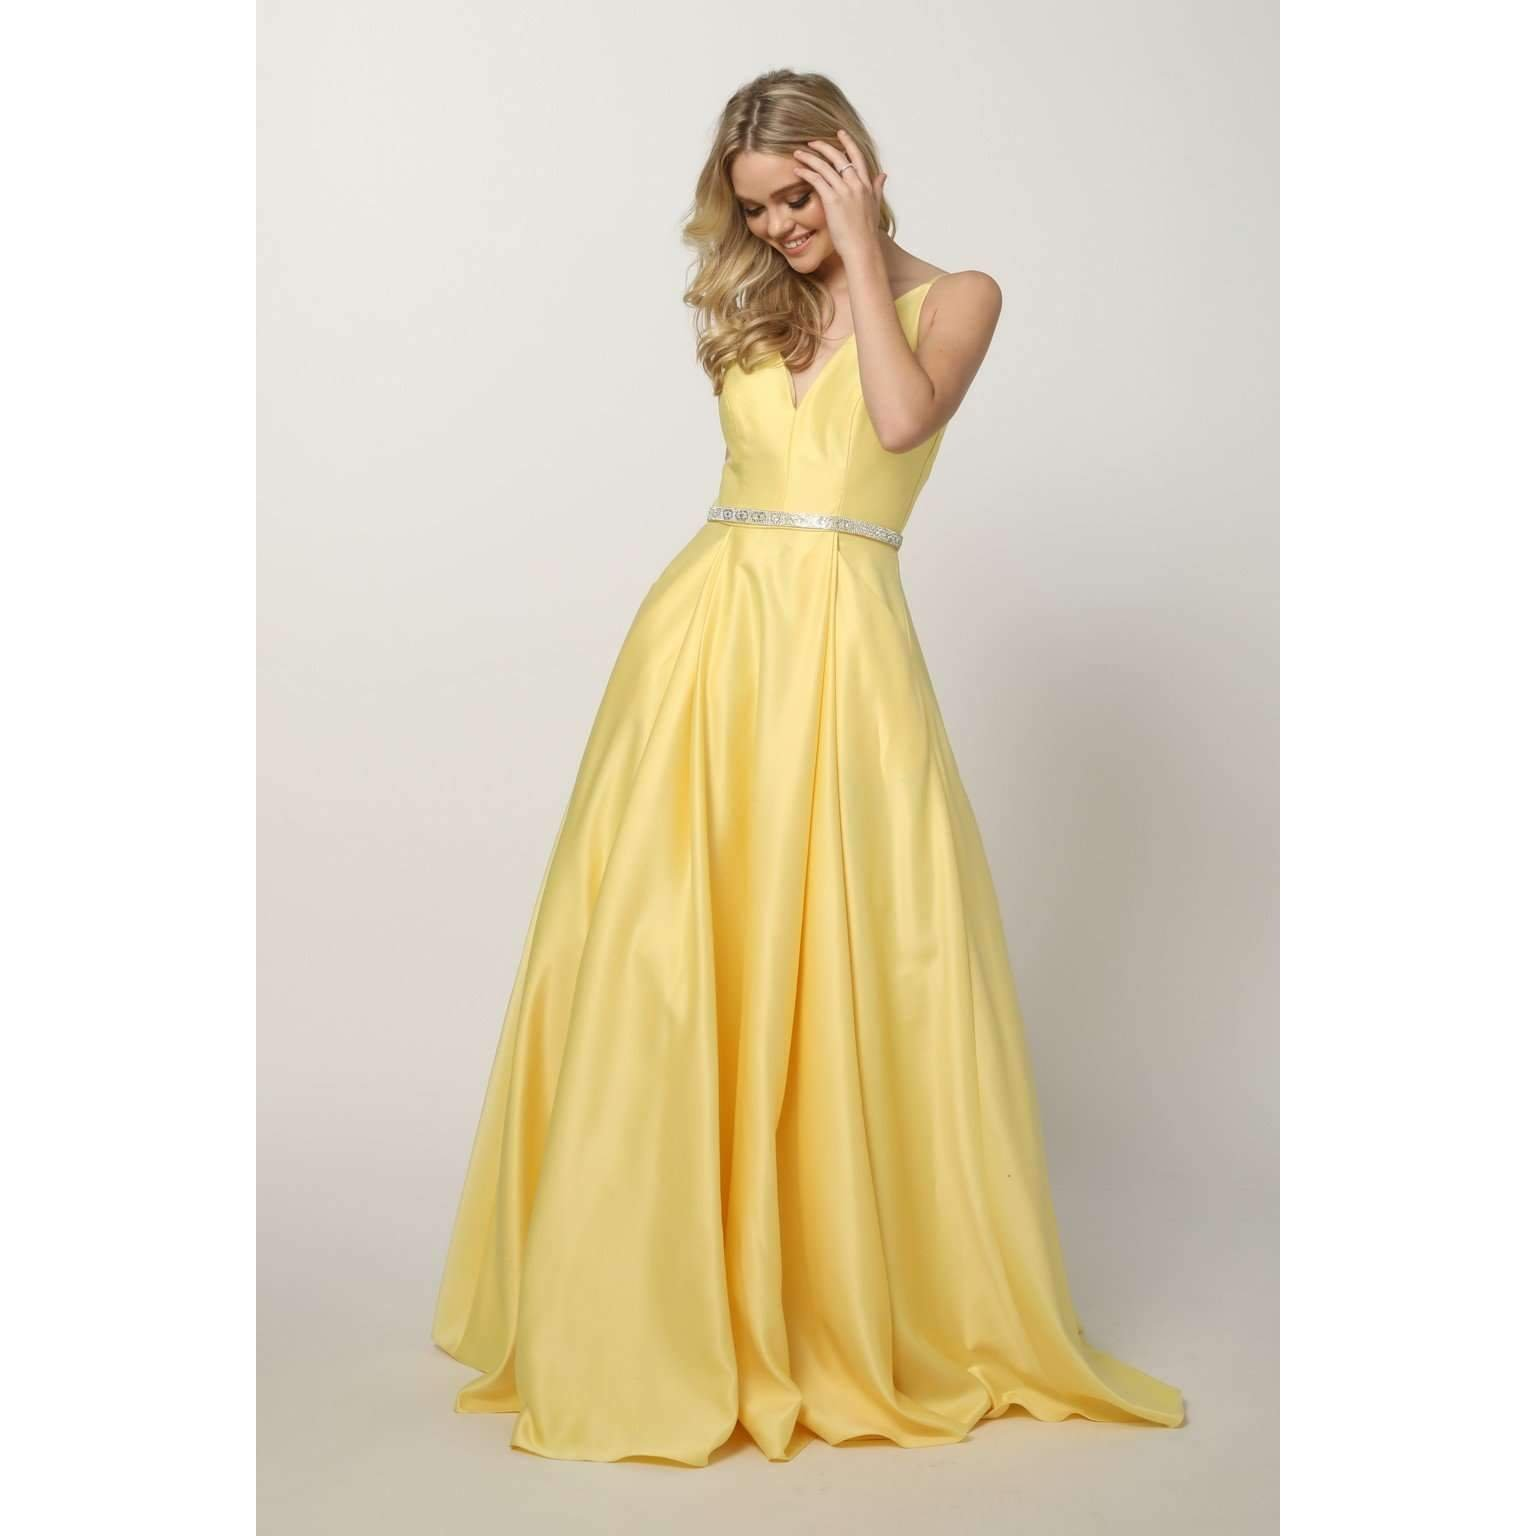 Yellow A Line Long Satin Dress with Rhinestone Belt